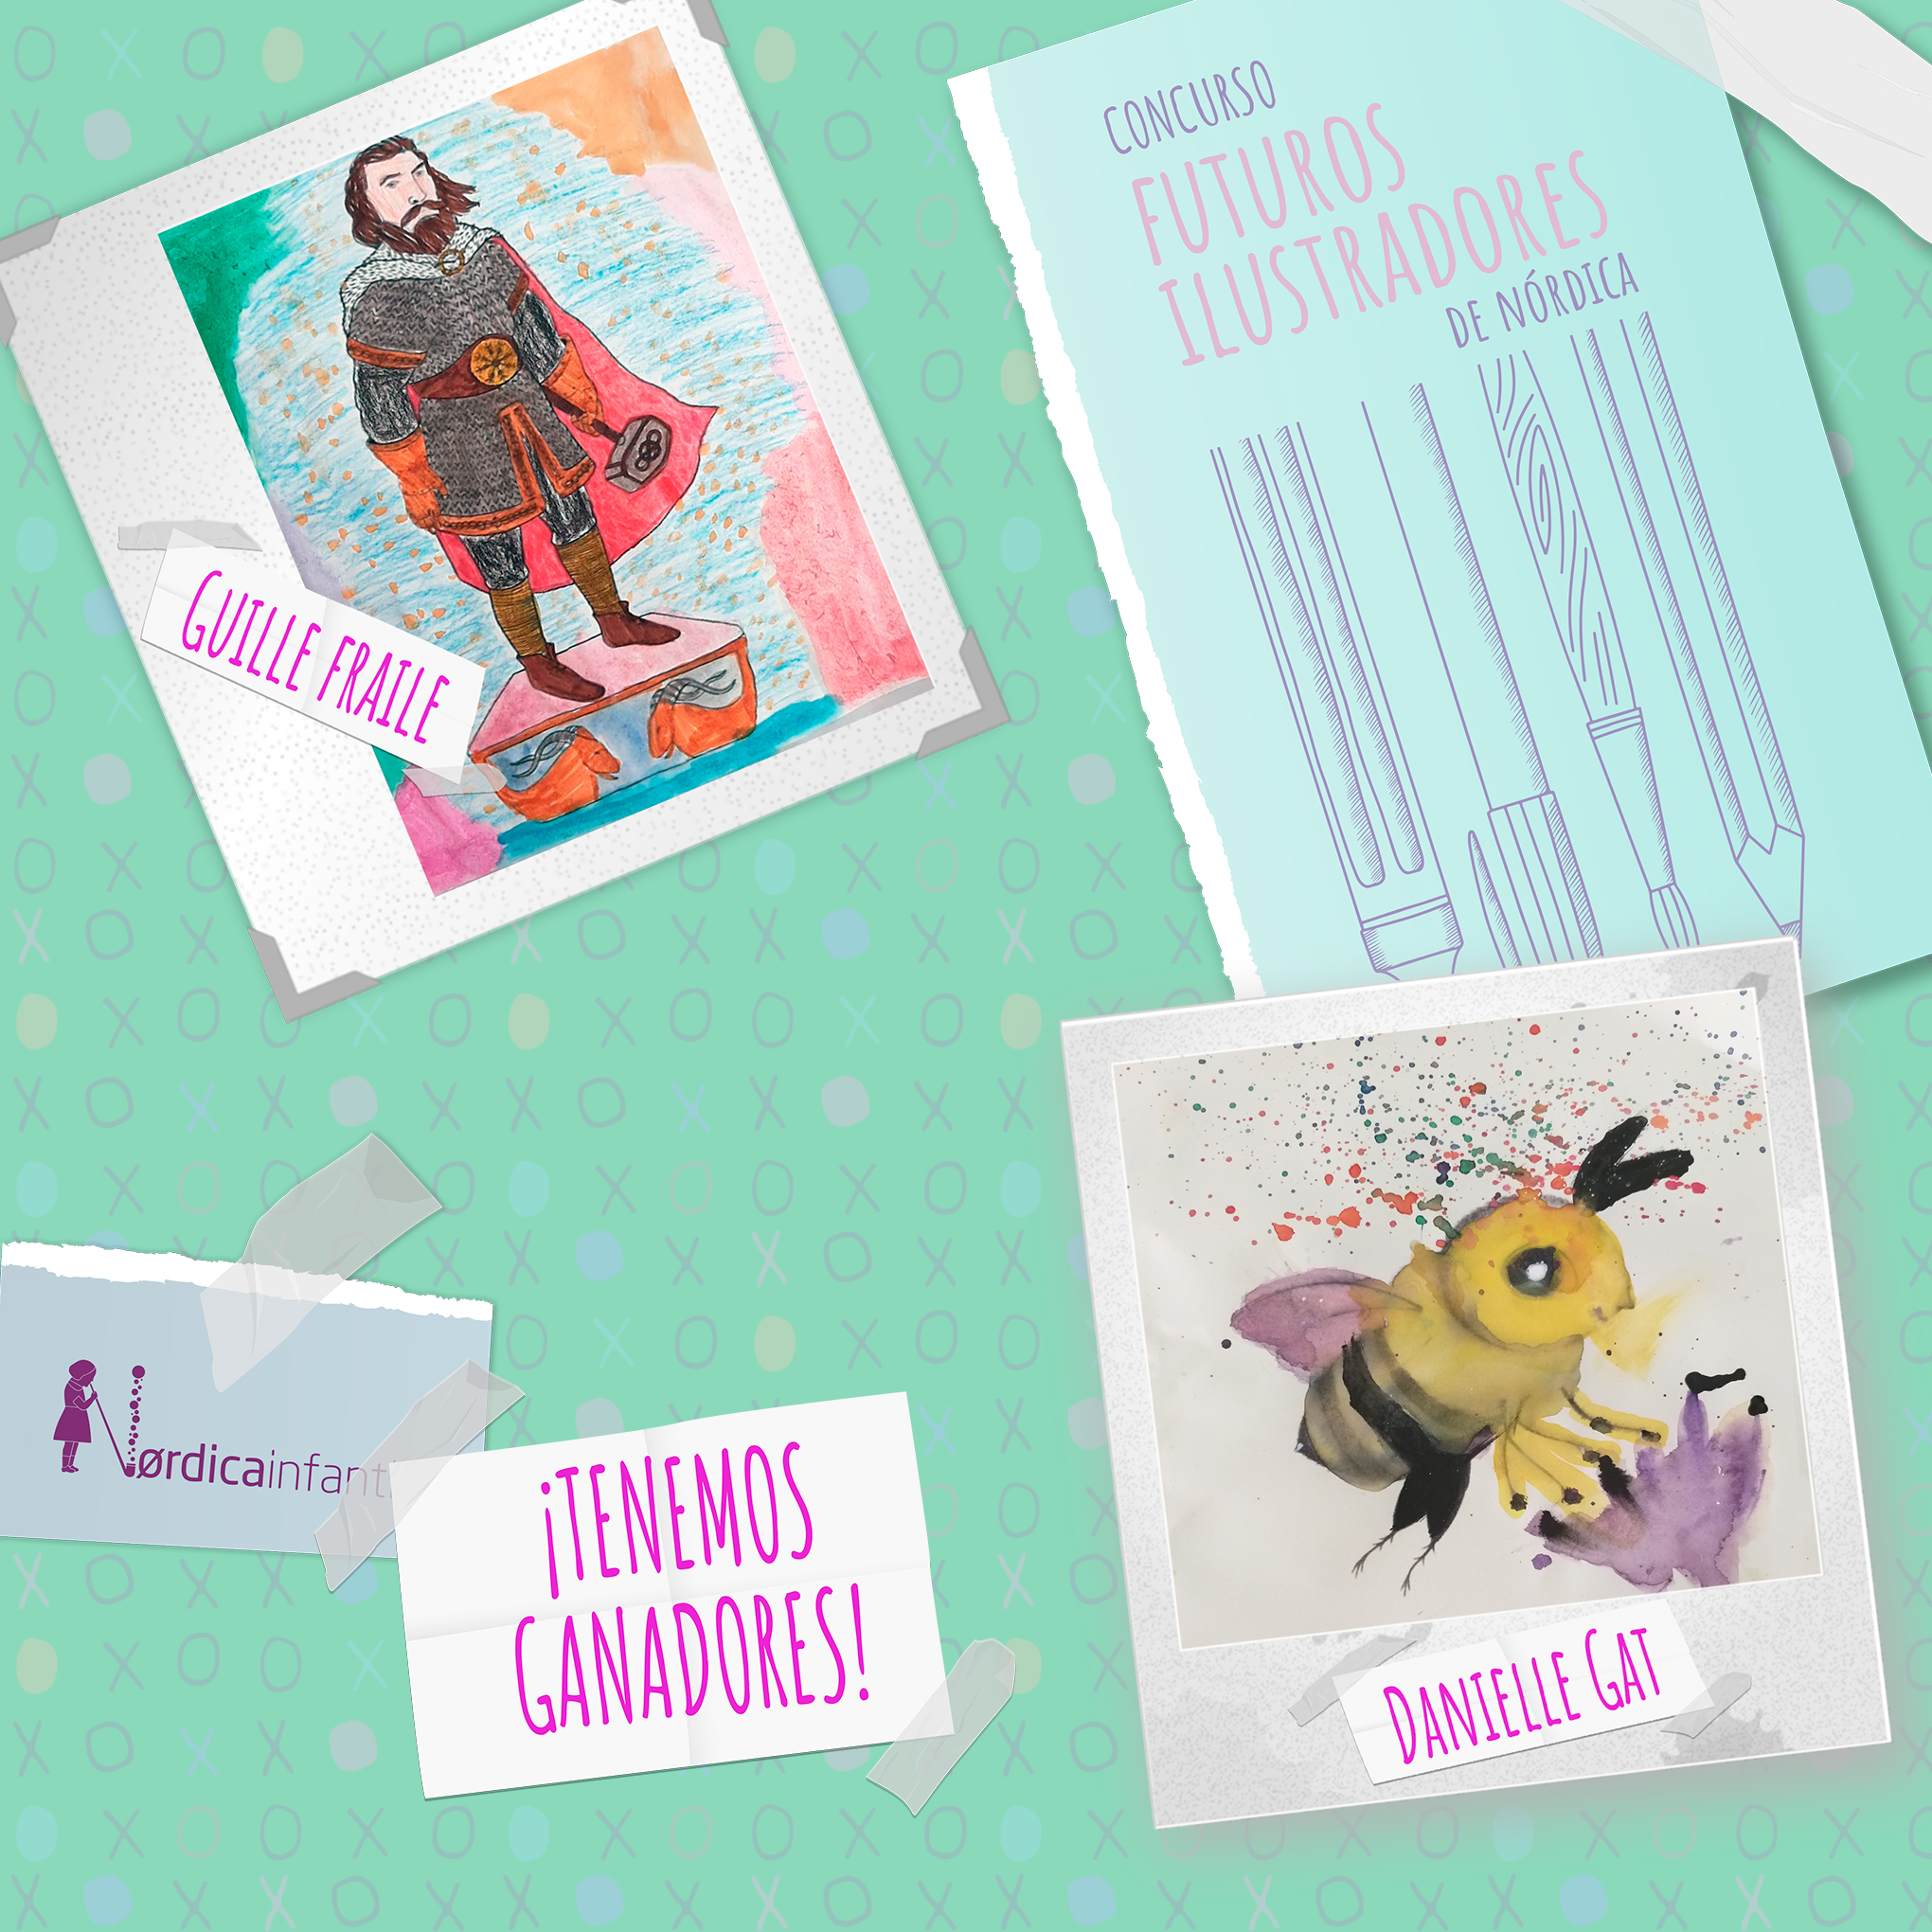 Futuros ilustradores Nórdica Infantil: ¡El fallo del concurso!